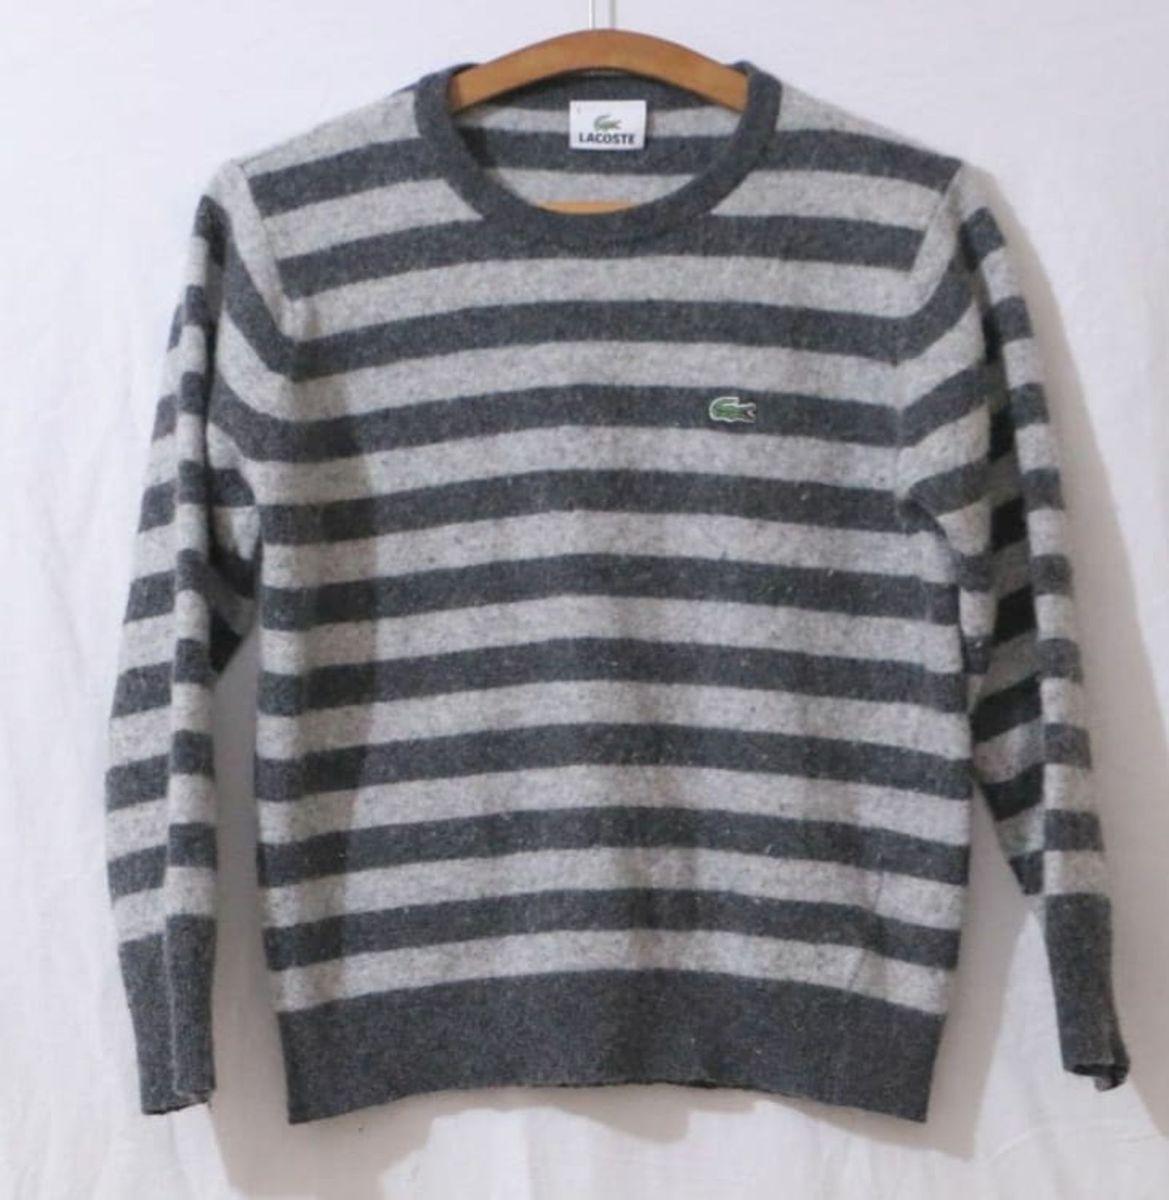 0bced8e6fd732 blusa lacoste original - casaquinhos lacoste.  Czm6ly9wag90b3muzw5qb2vplmnvbs5ici9wcm9kdwn0cy8zodq4otyvzwizyzi1nzy5yjrkn2i3njvhzwqznwuxmta4mwzhnwiuanbn  ...